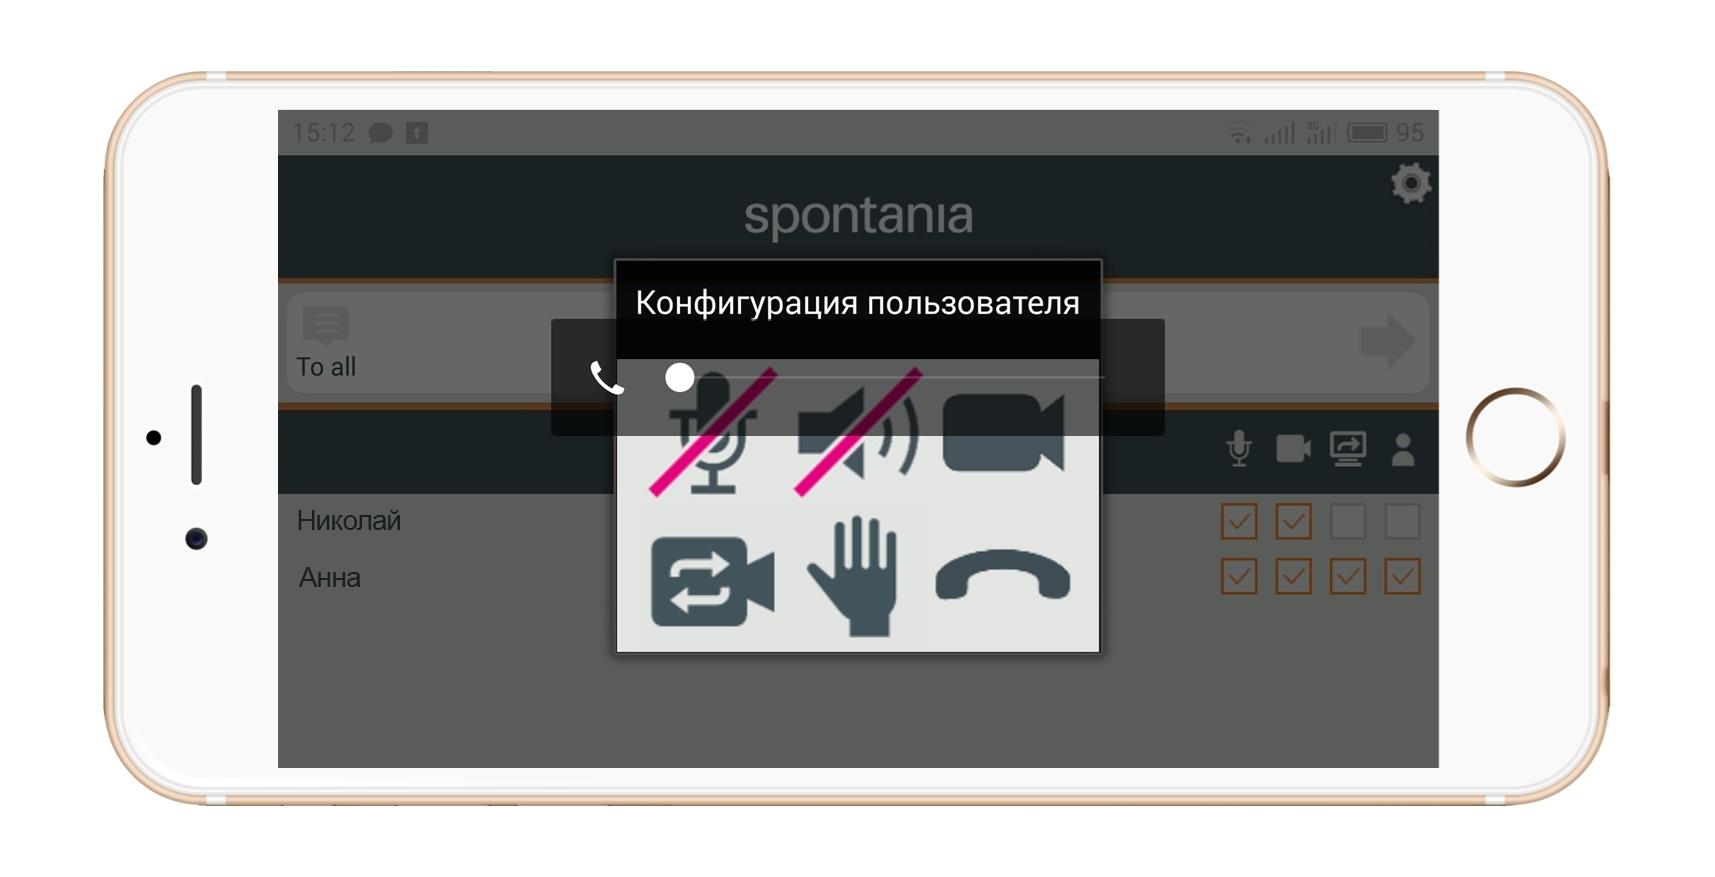 ClearOne Sp Ent 25 - Программный продукт Spontania Enterprise - 25